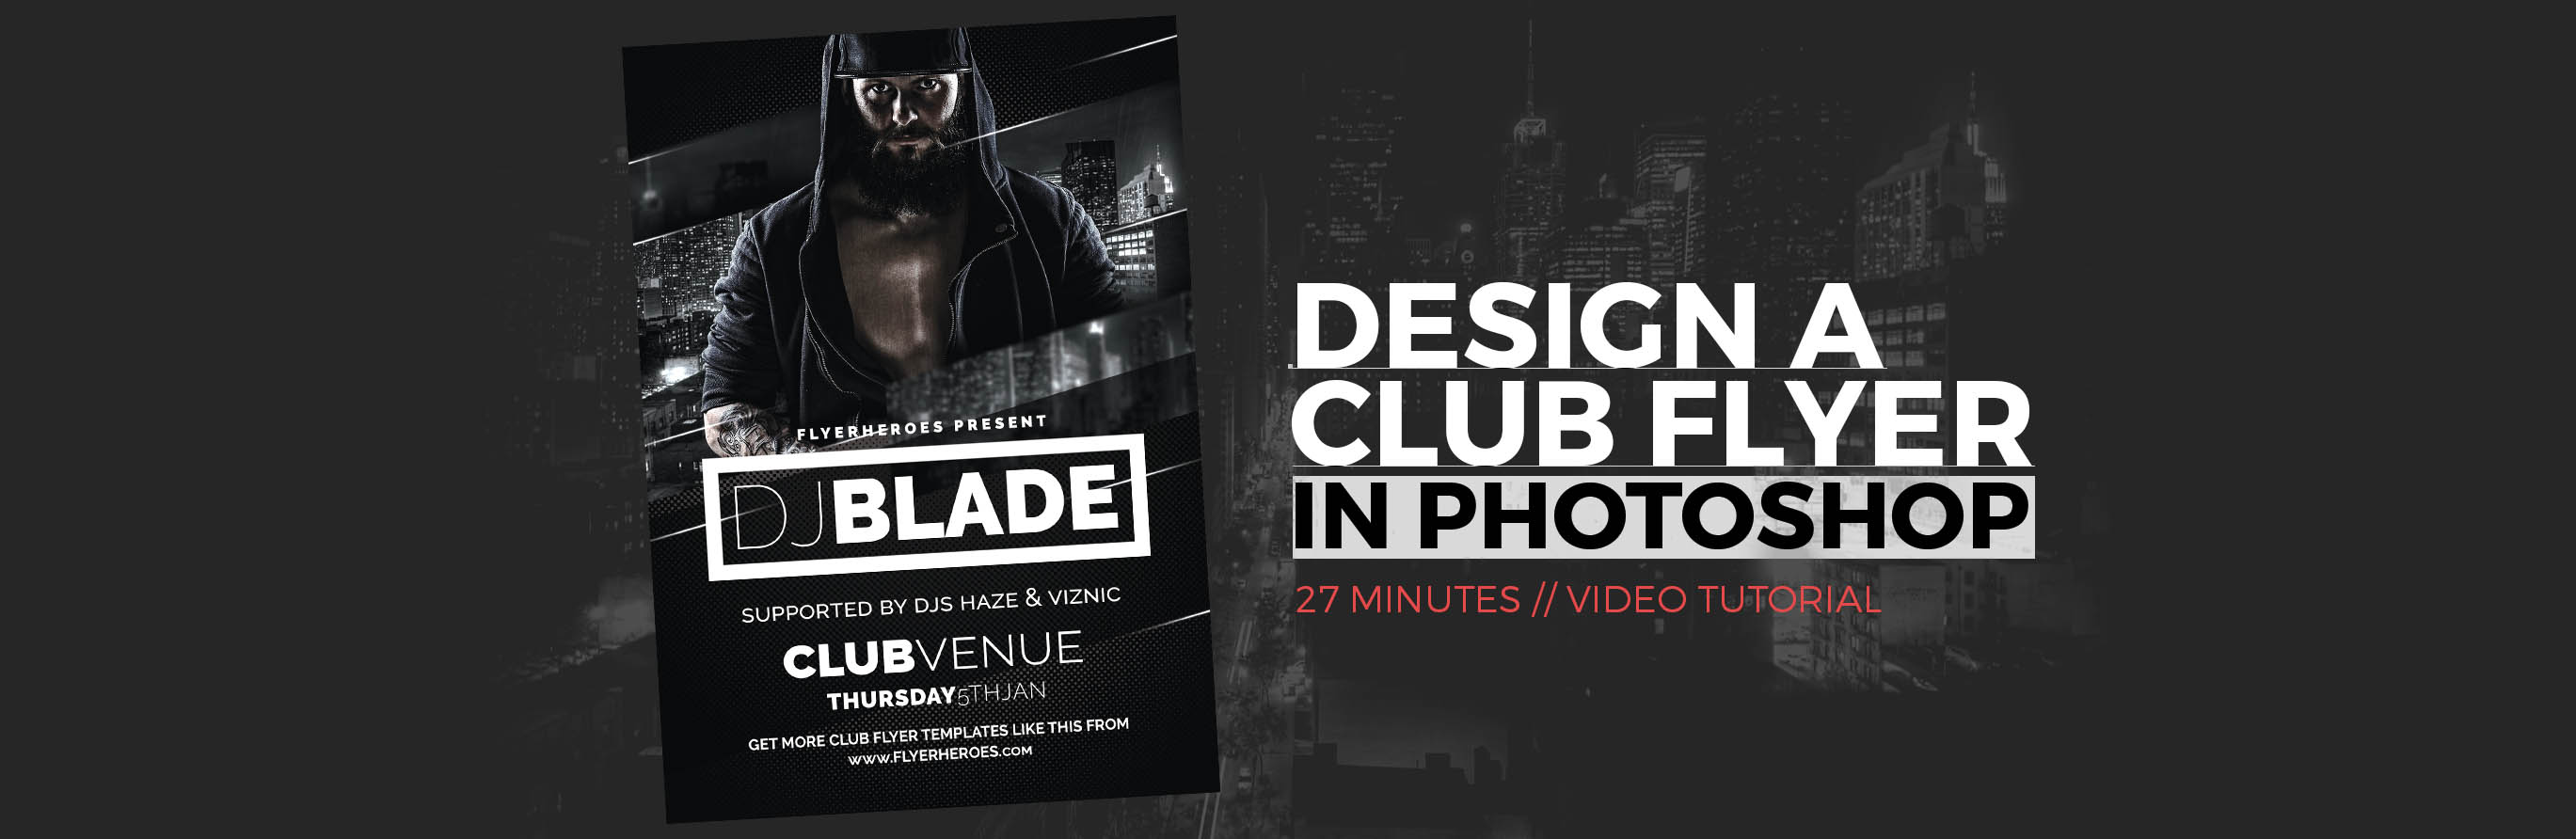 Design a Club Flyer in Photoshop - Flyer Design Tutorial